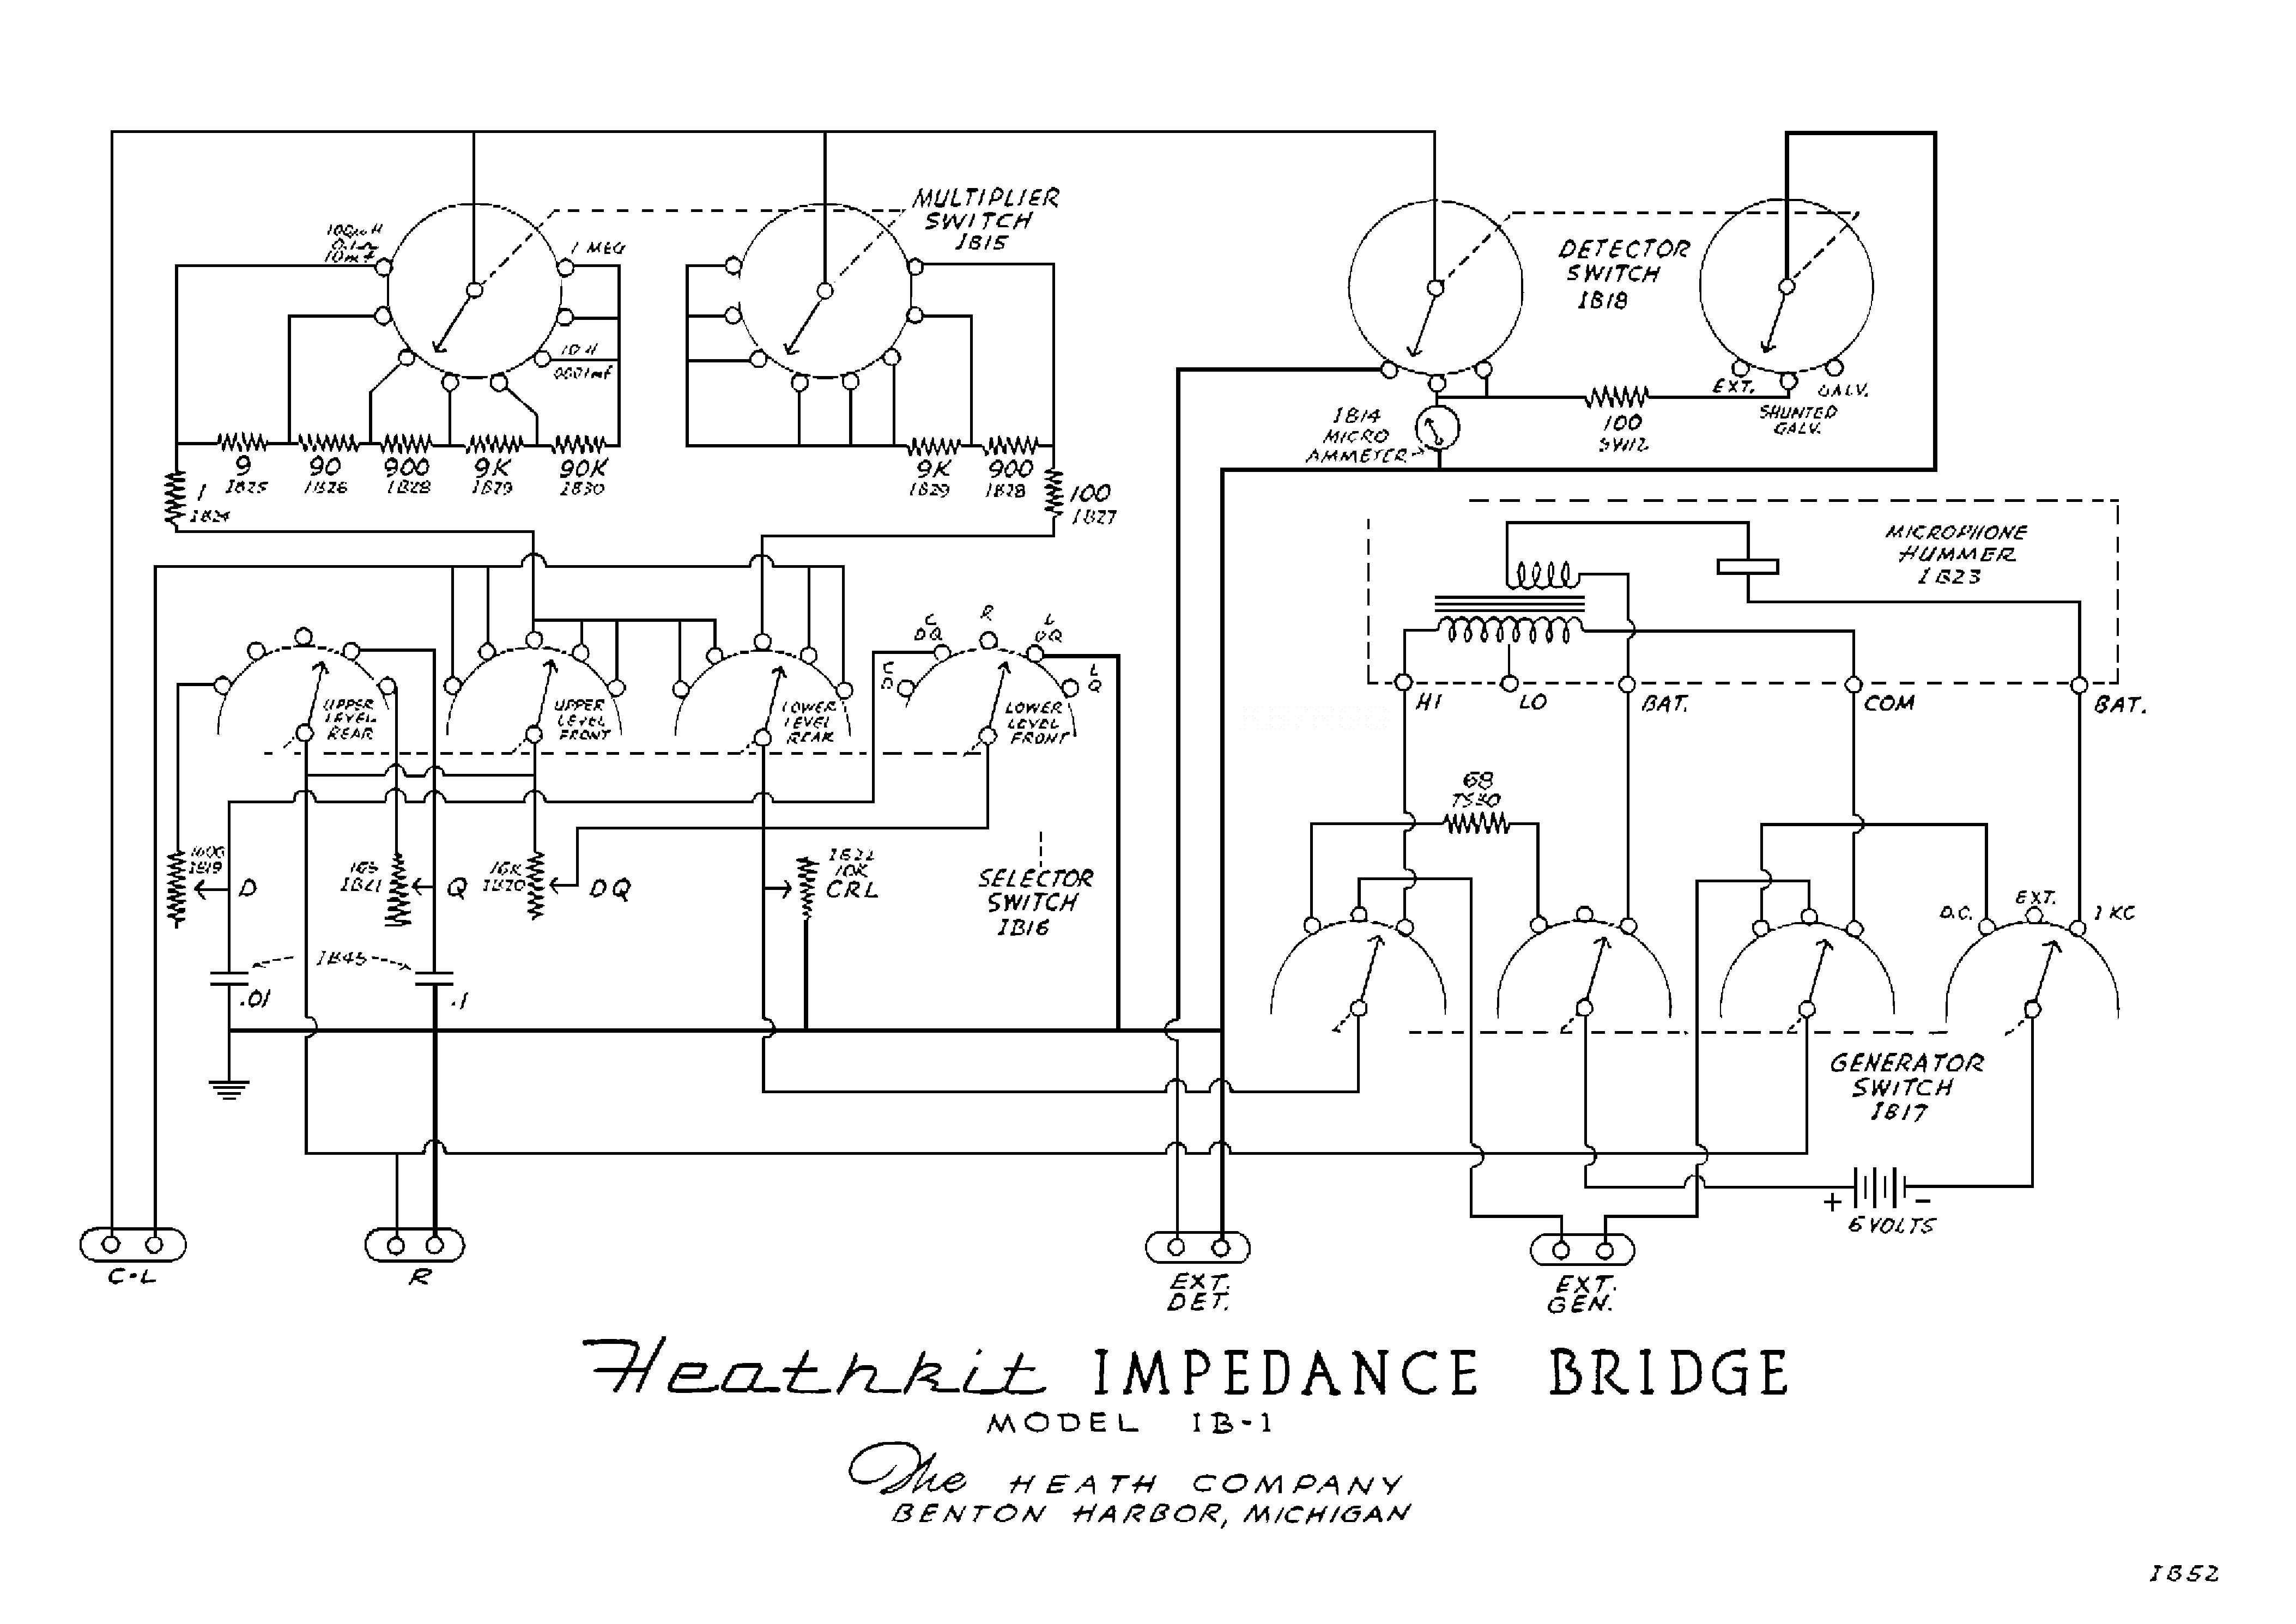 heathkit gd1u grid dip meter sch service manual download  schematics  eeprom  repair info for